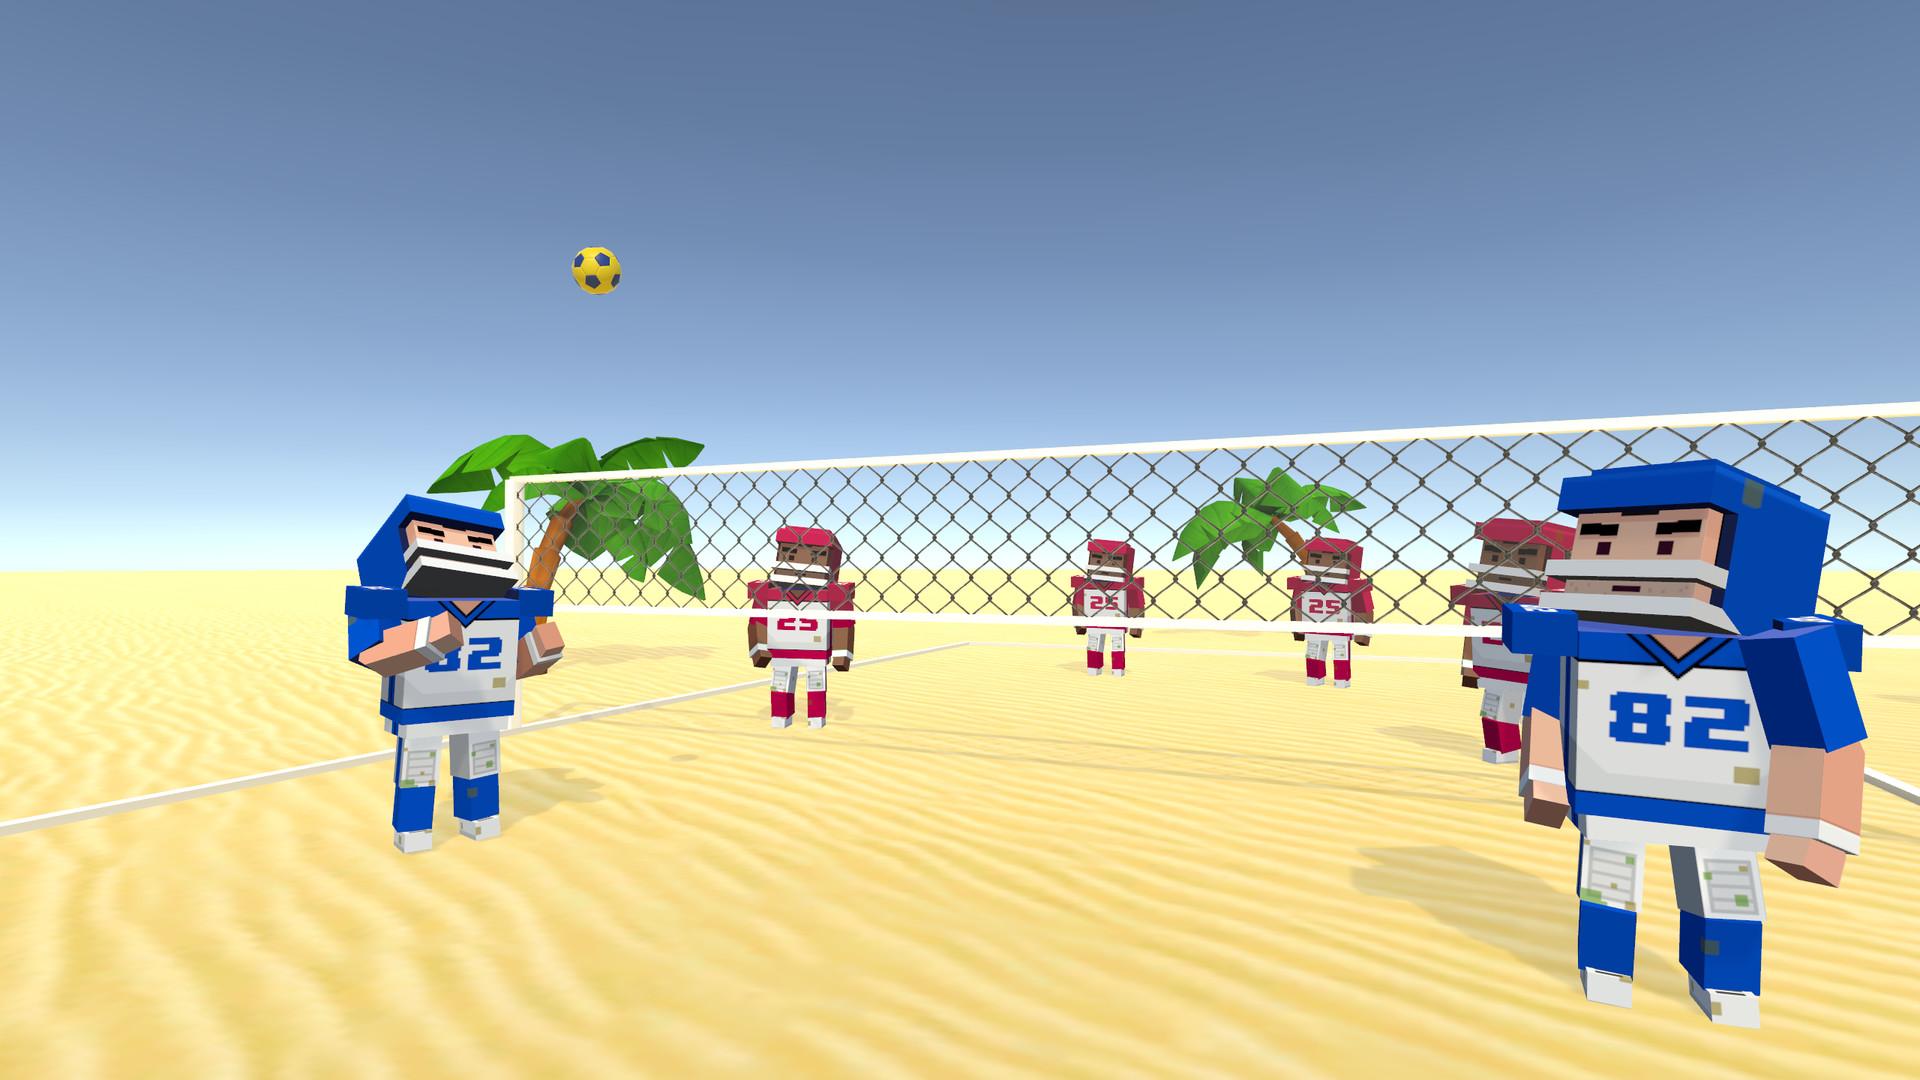 Oculus Quest 游戏《Volleyball Fever》狂热排球插图(3)